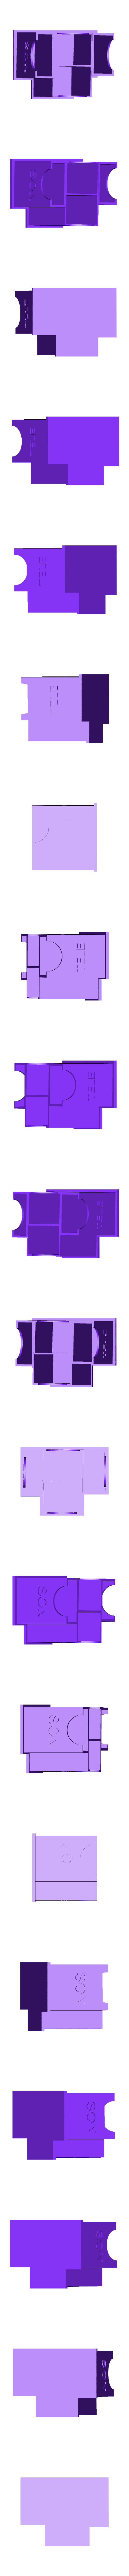 tv3.stl Download free STL file Range telecomandes • 3D printable template, Cyborg